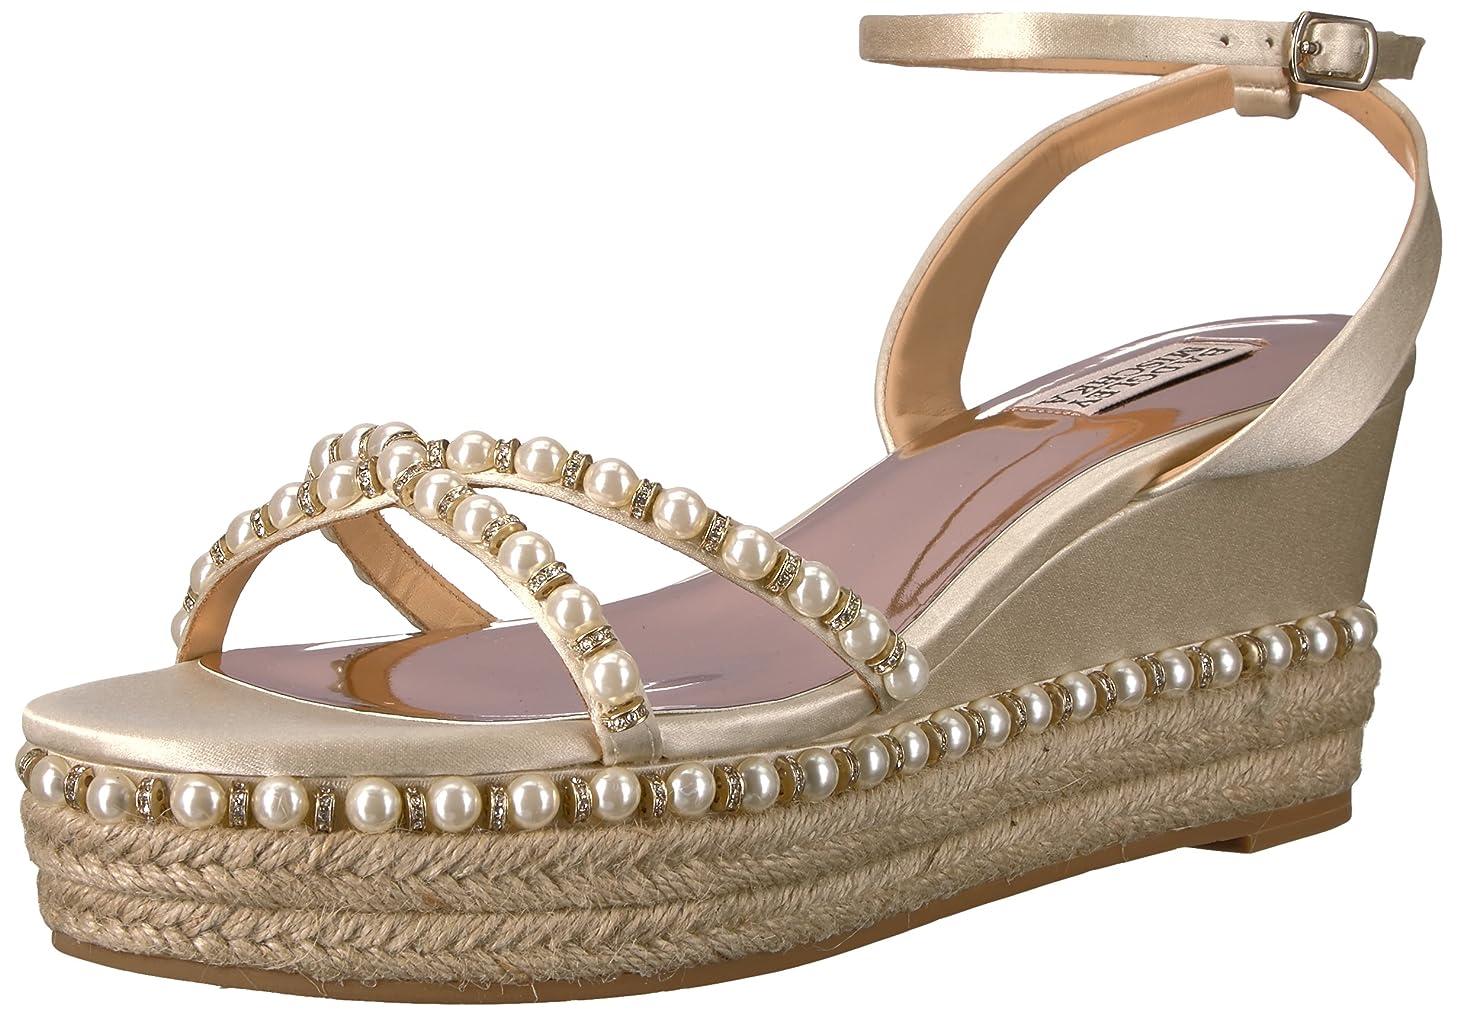 Badgley Mischka Women's Skye Espadrille Wedge Sandal